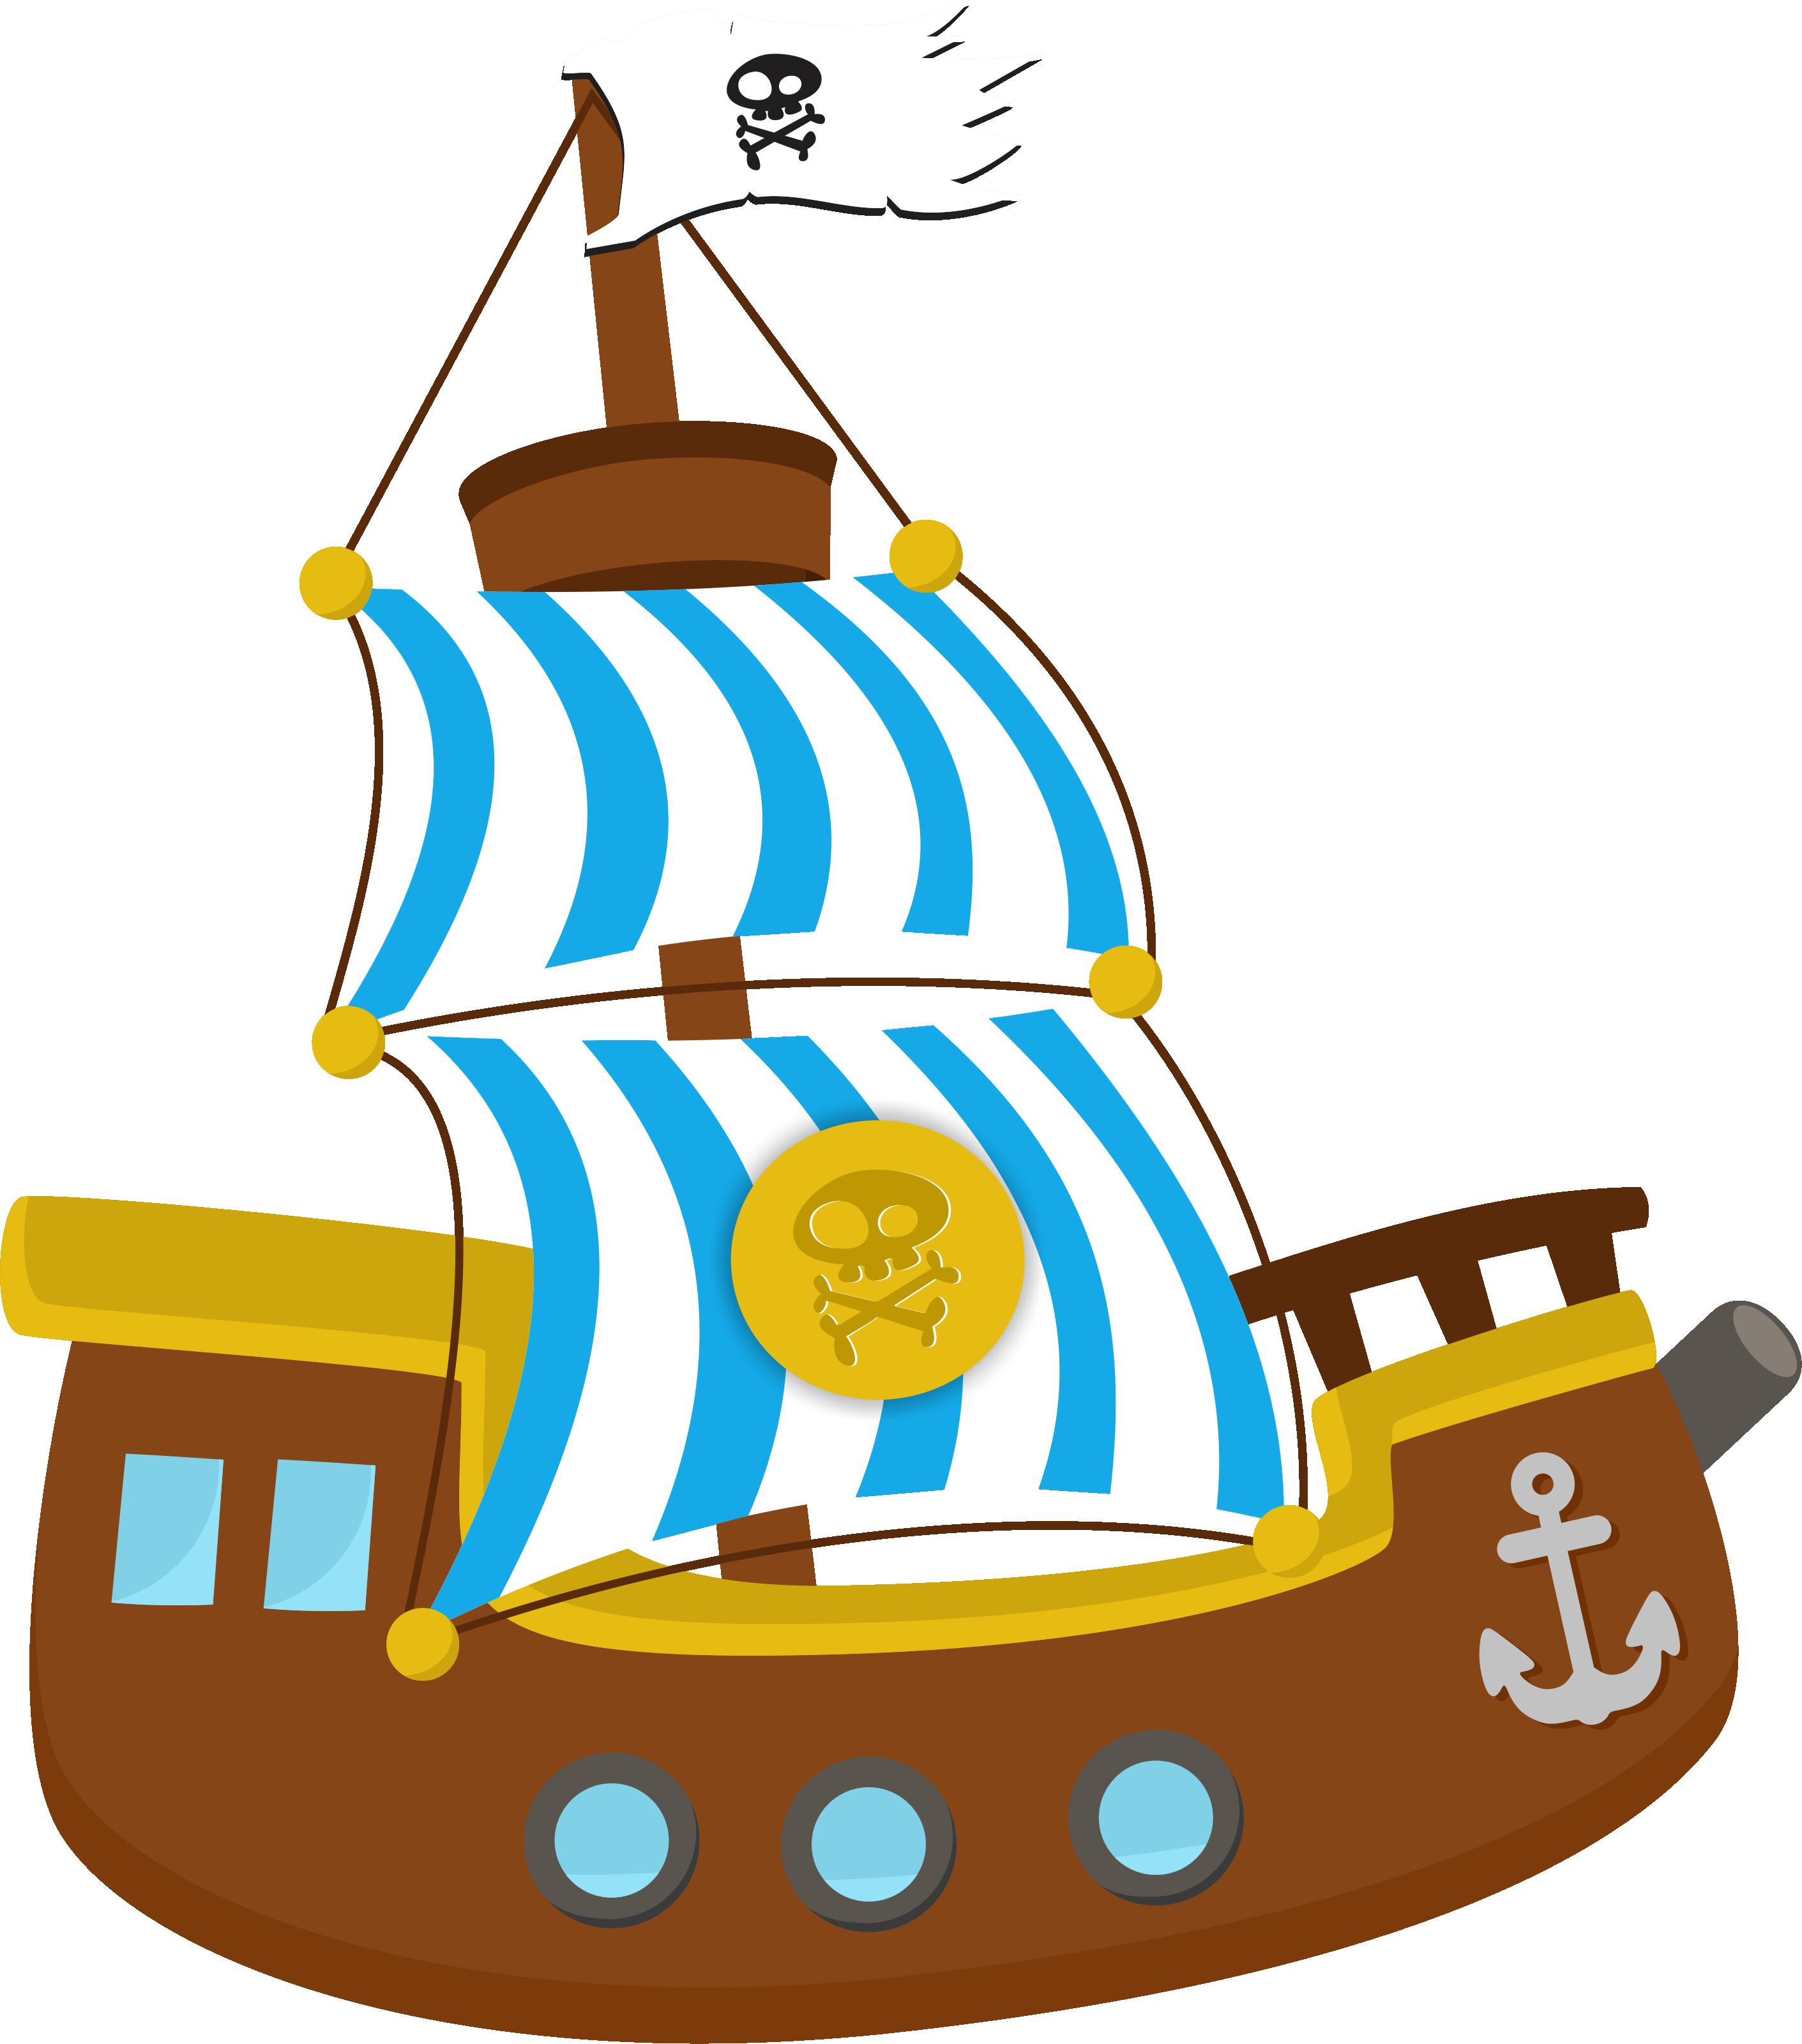 Minus - Selma De Avila Bueno   My kids clips   Pinterest   Piratas ...